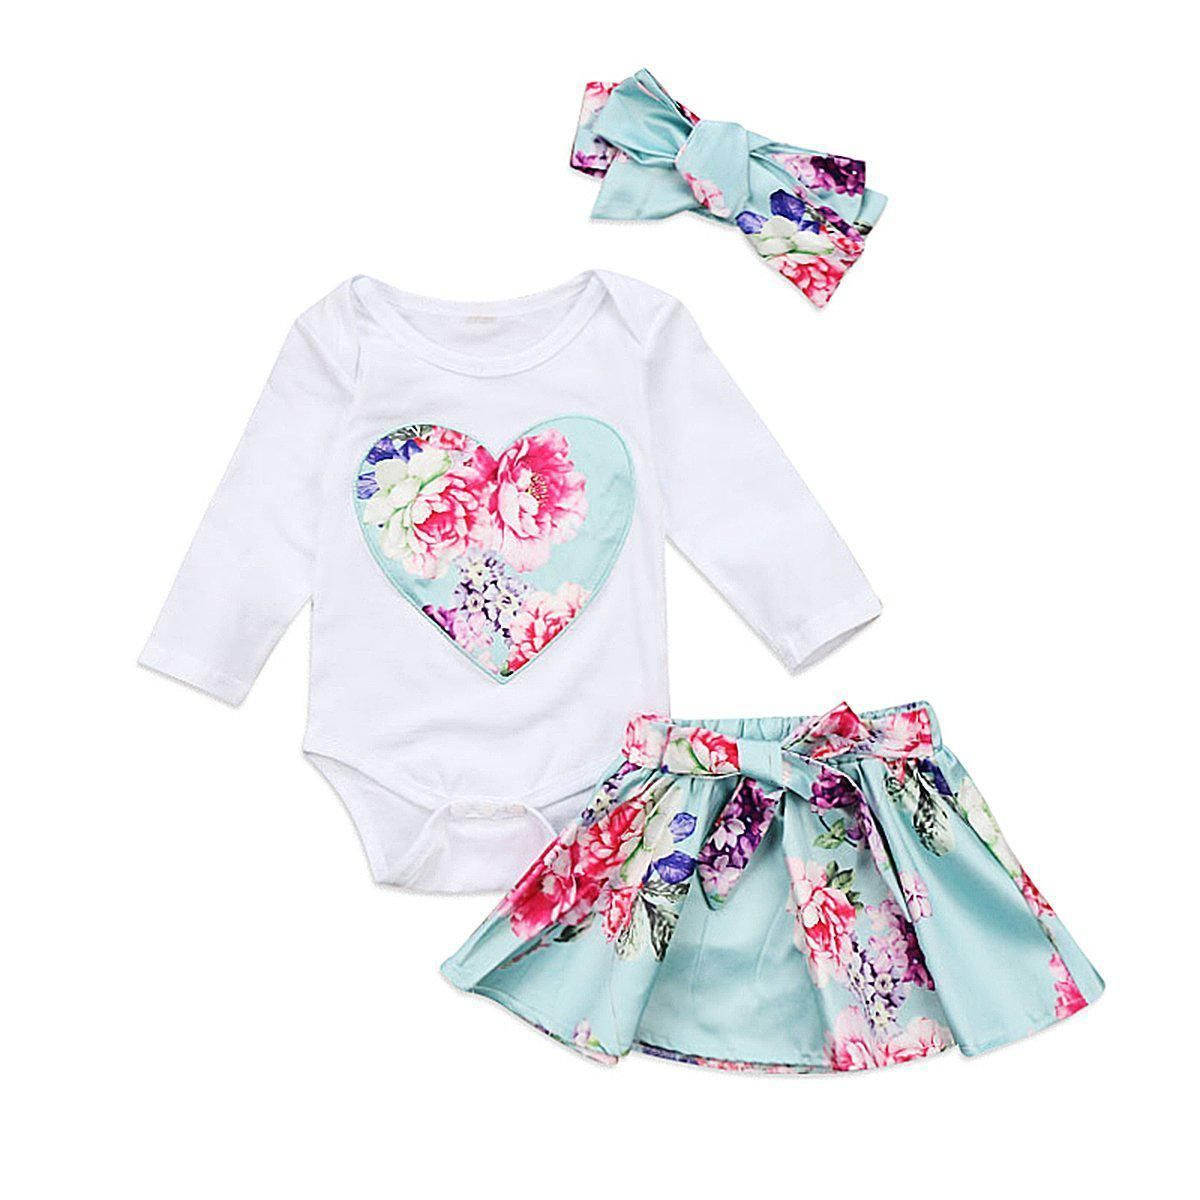 f34d8ac0d0f7 Heartless 3 piece set-outfit-Lavendersun